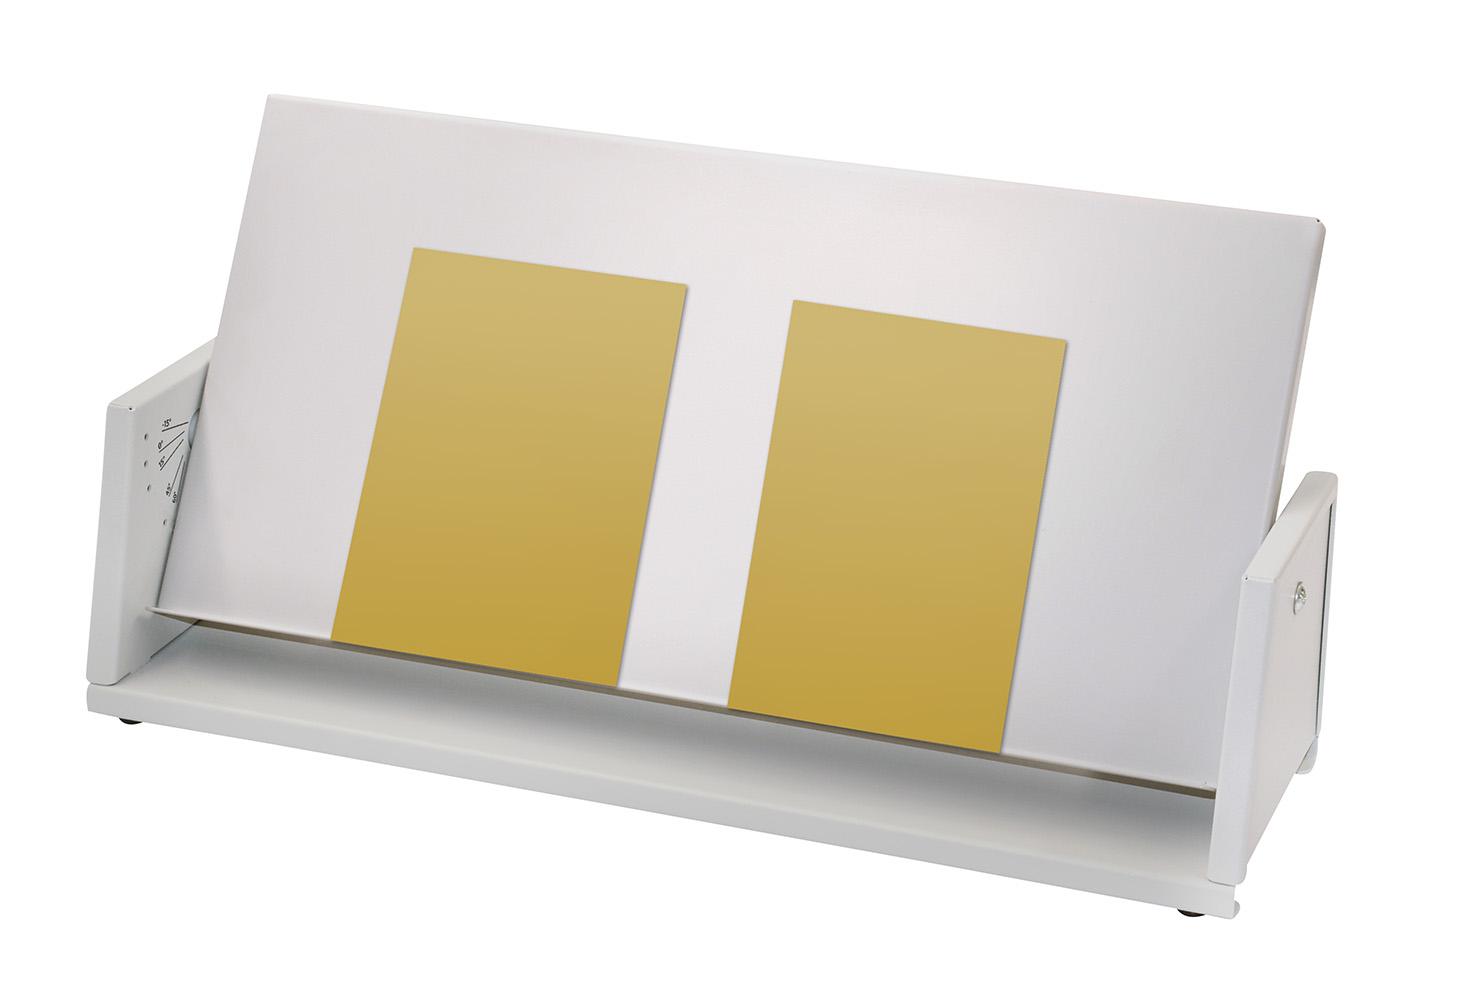 Matching sample holders